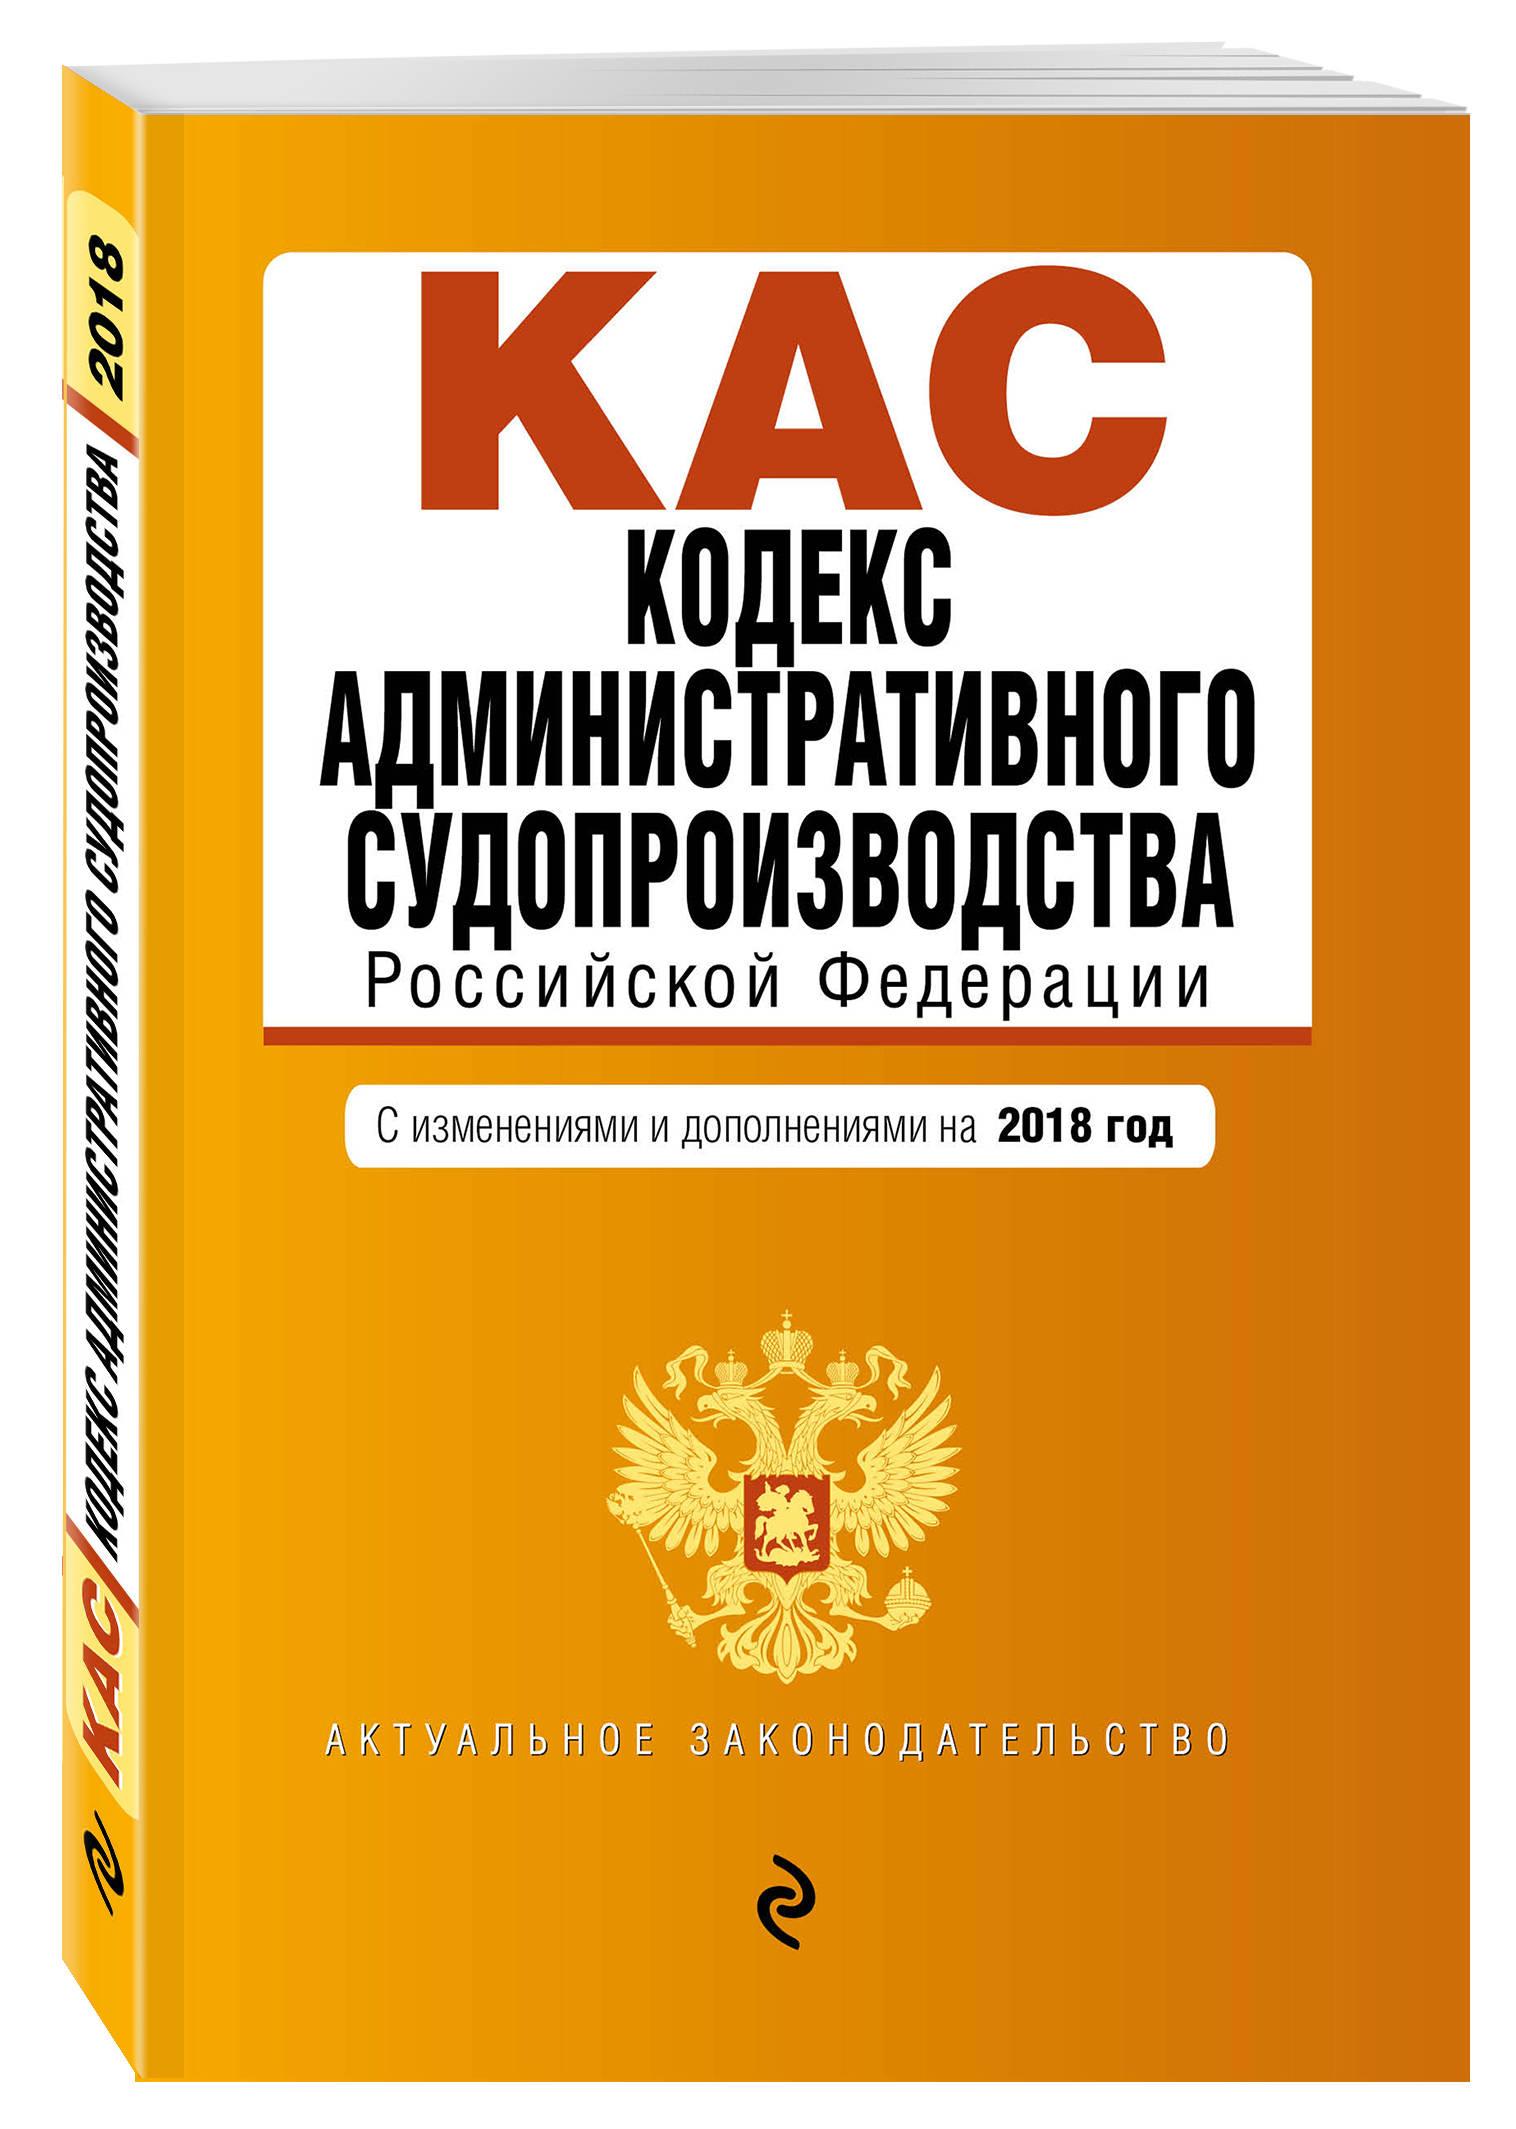 Кодекс административного судопроизводства РФ: с изм. и доп. на 2018 г. кодекс административного судопроизводства рф по сост на 25 03 17 с таблицей изменений